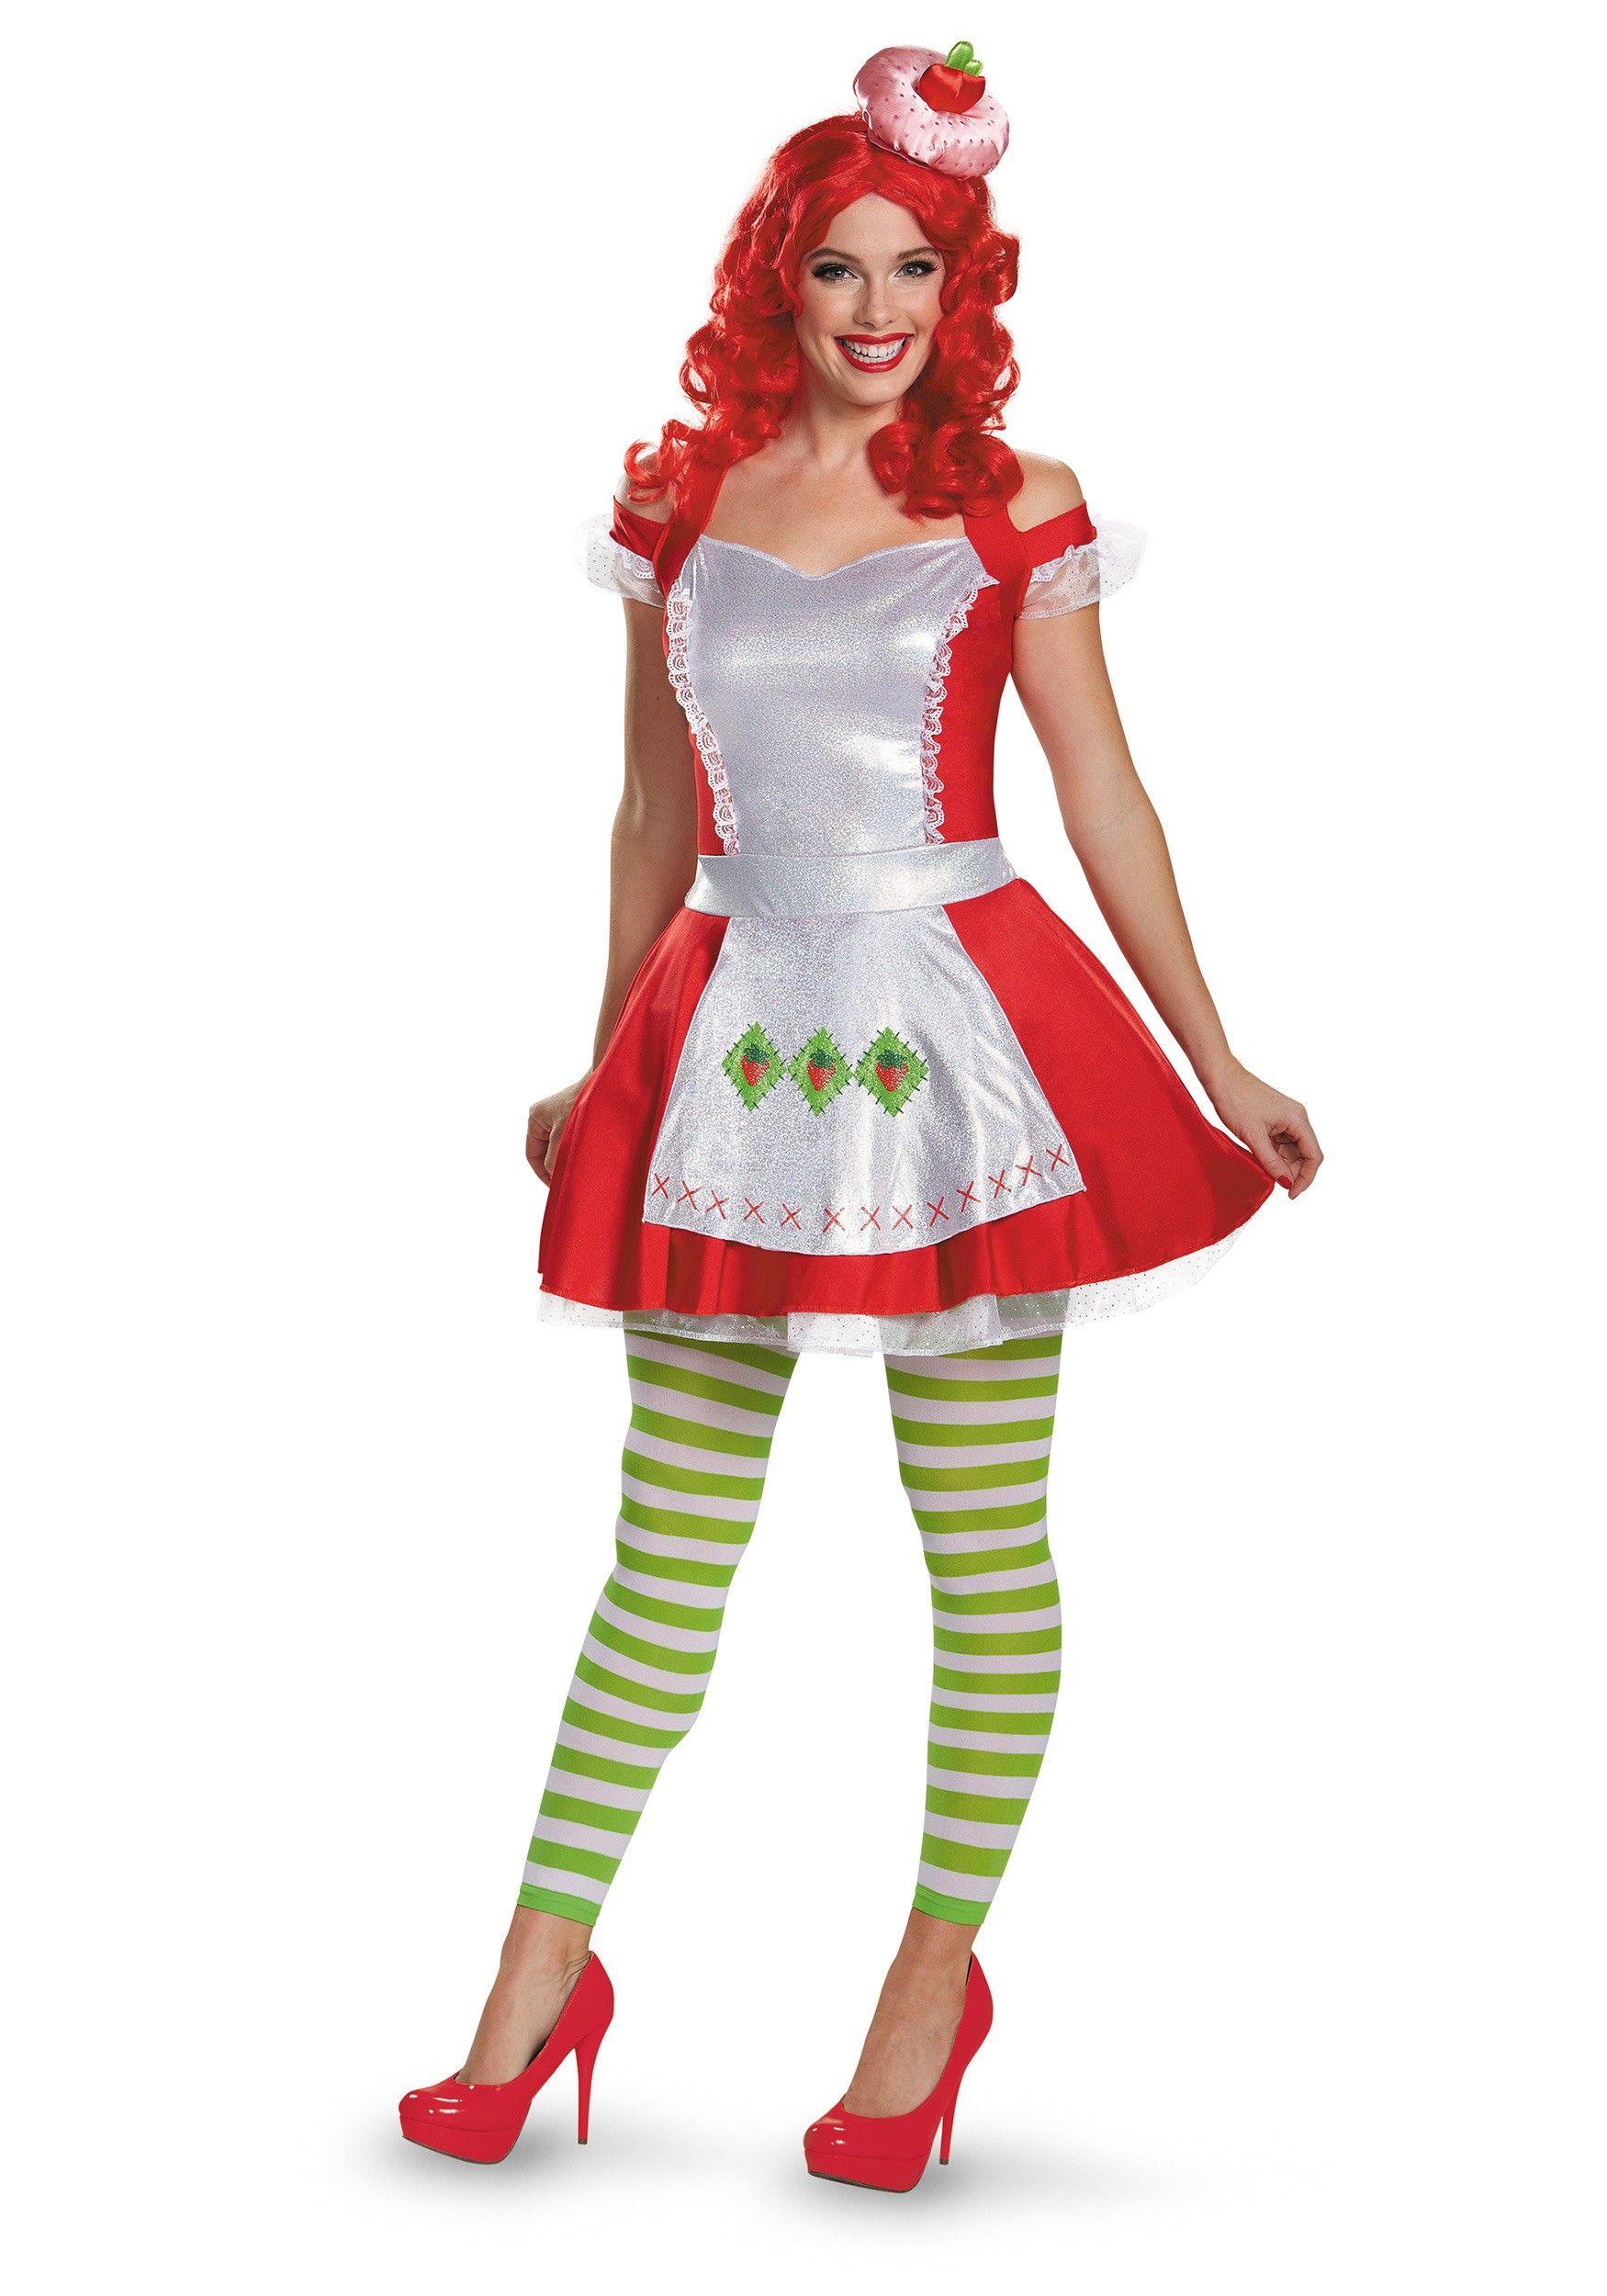 Strawberry Shortcake Deluxe Adult Costume Strawberry